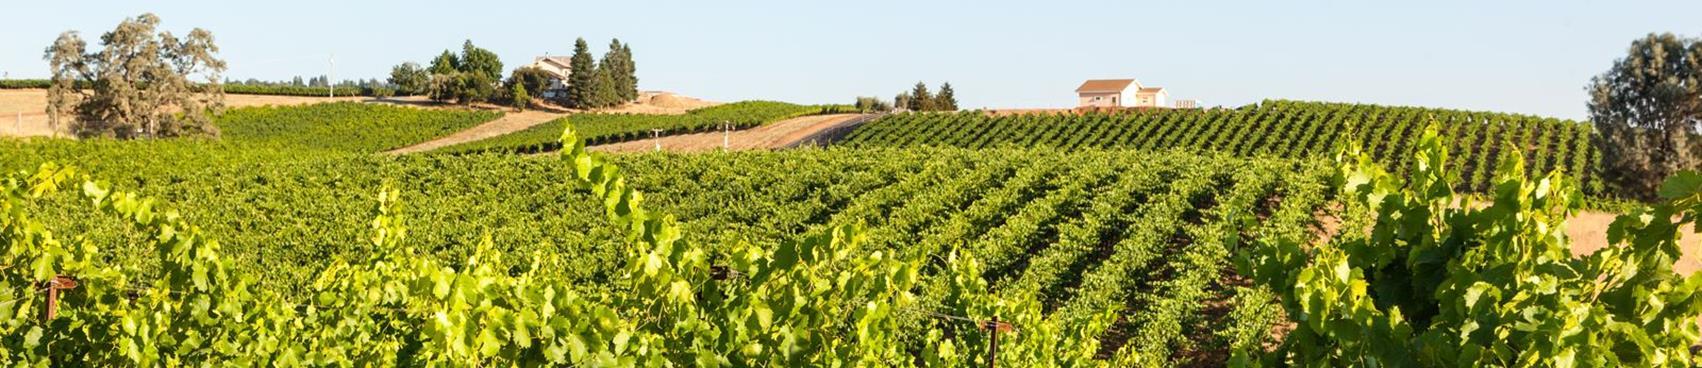 A image of Shadow Ranch Vineyard